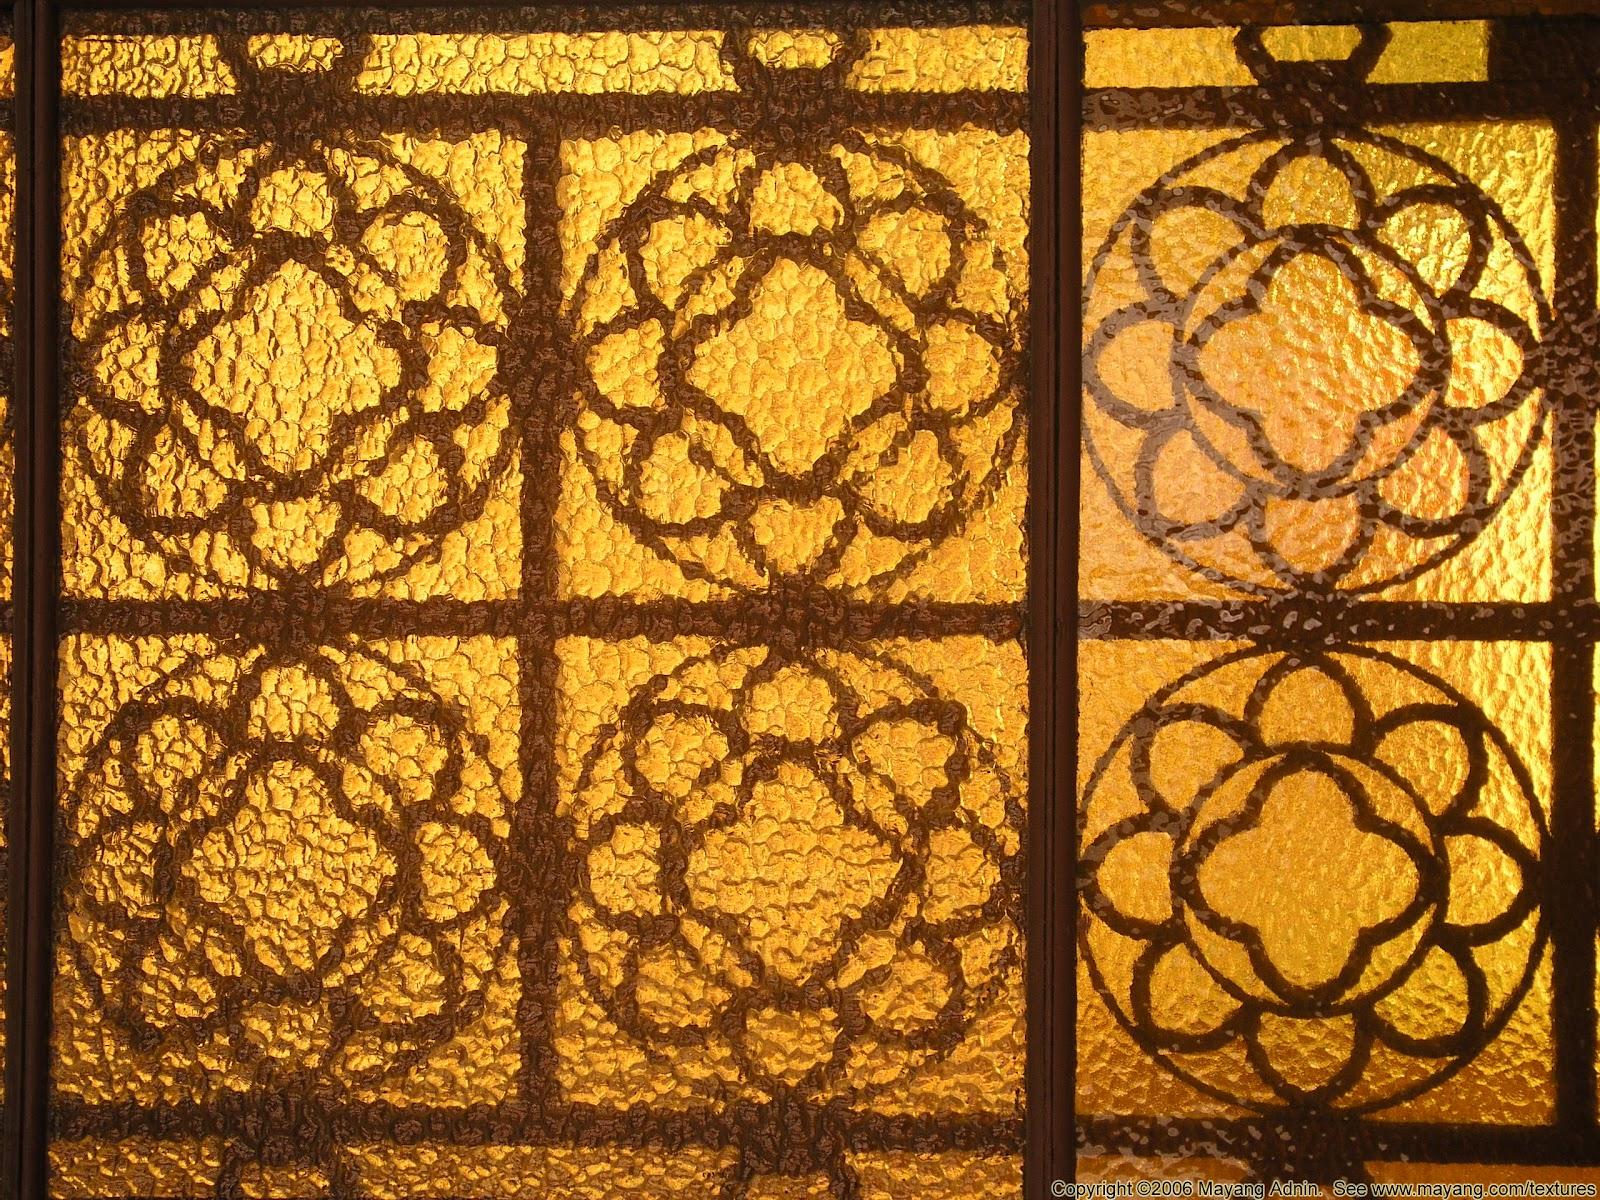 mayangs textures manmade food - photo #10